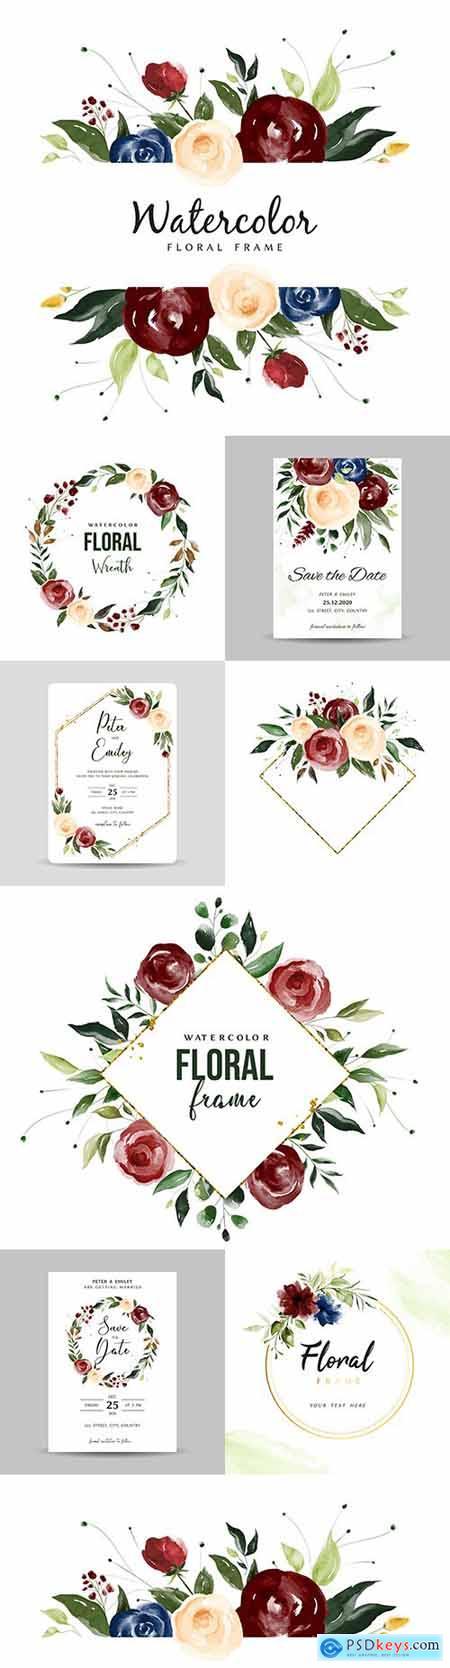 Watercolor flower frame for wedding invitation design